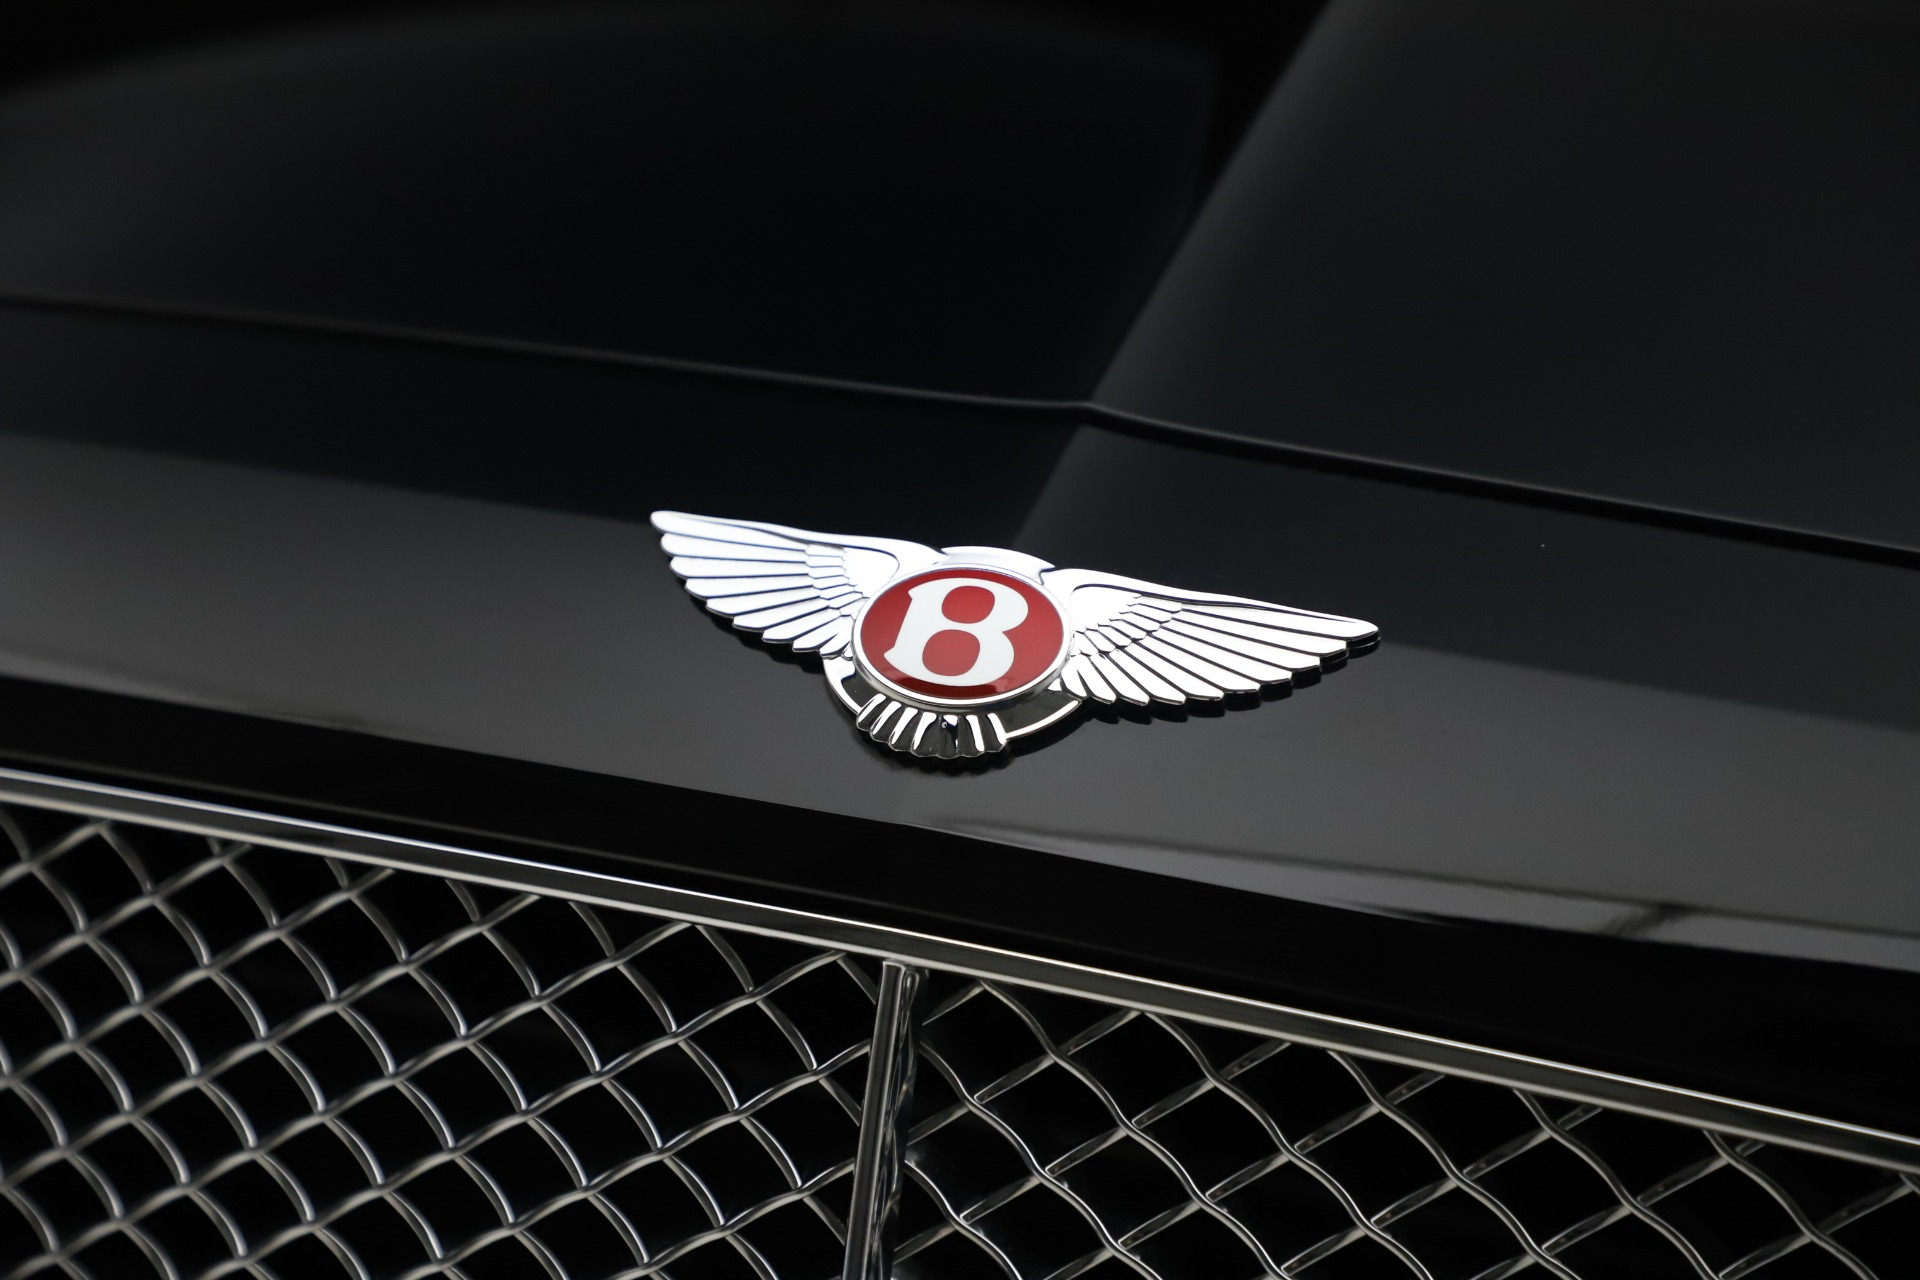 Used 2016 Bentley Flying Spur V8 For Sale In Westport, CT 3526_p14